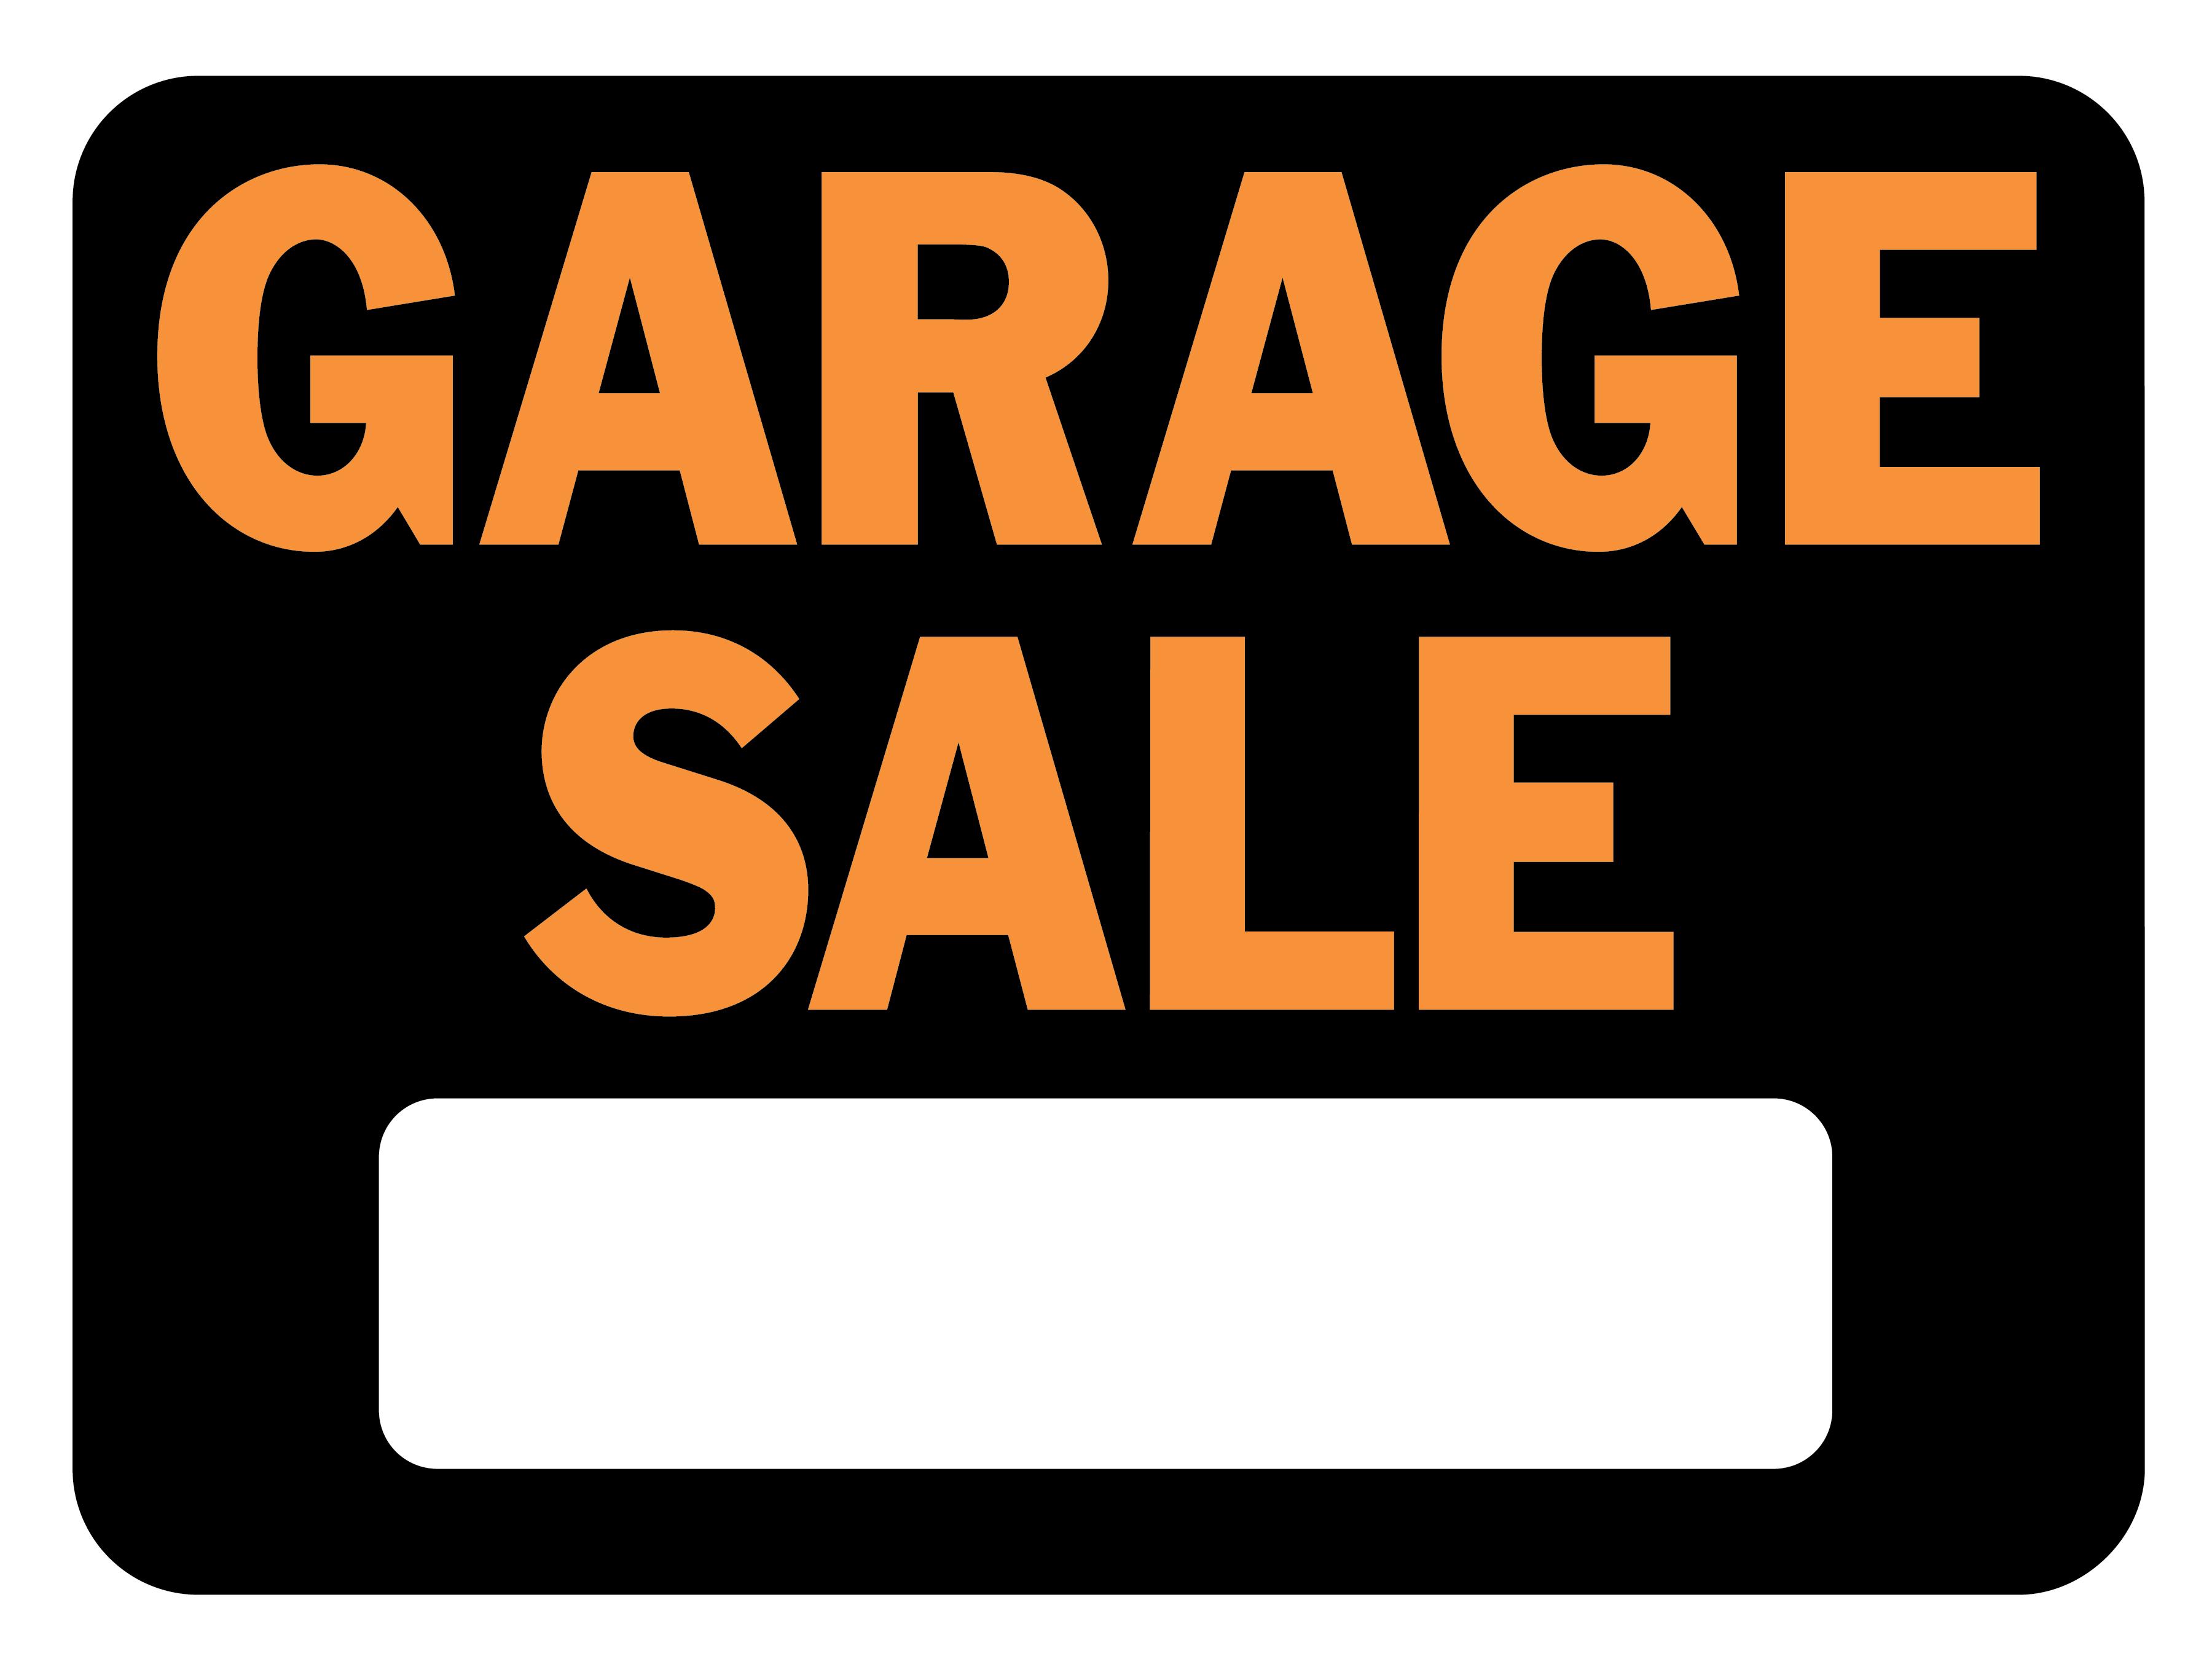 3600x2700 Free Printable Yard Sale Signs